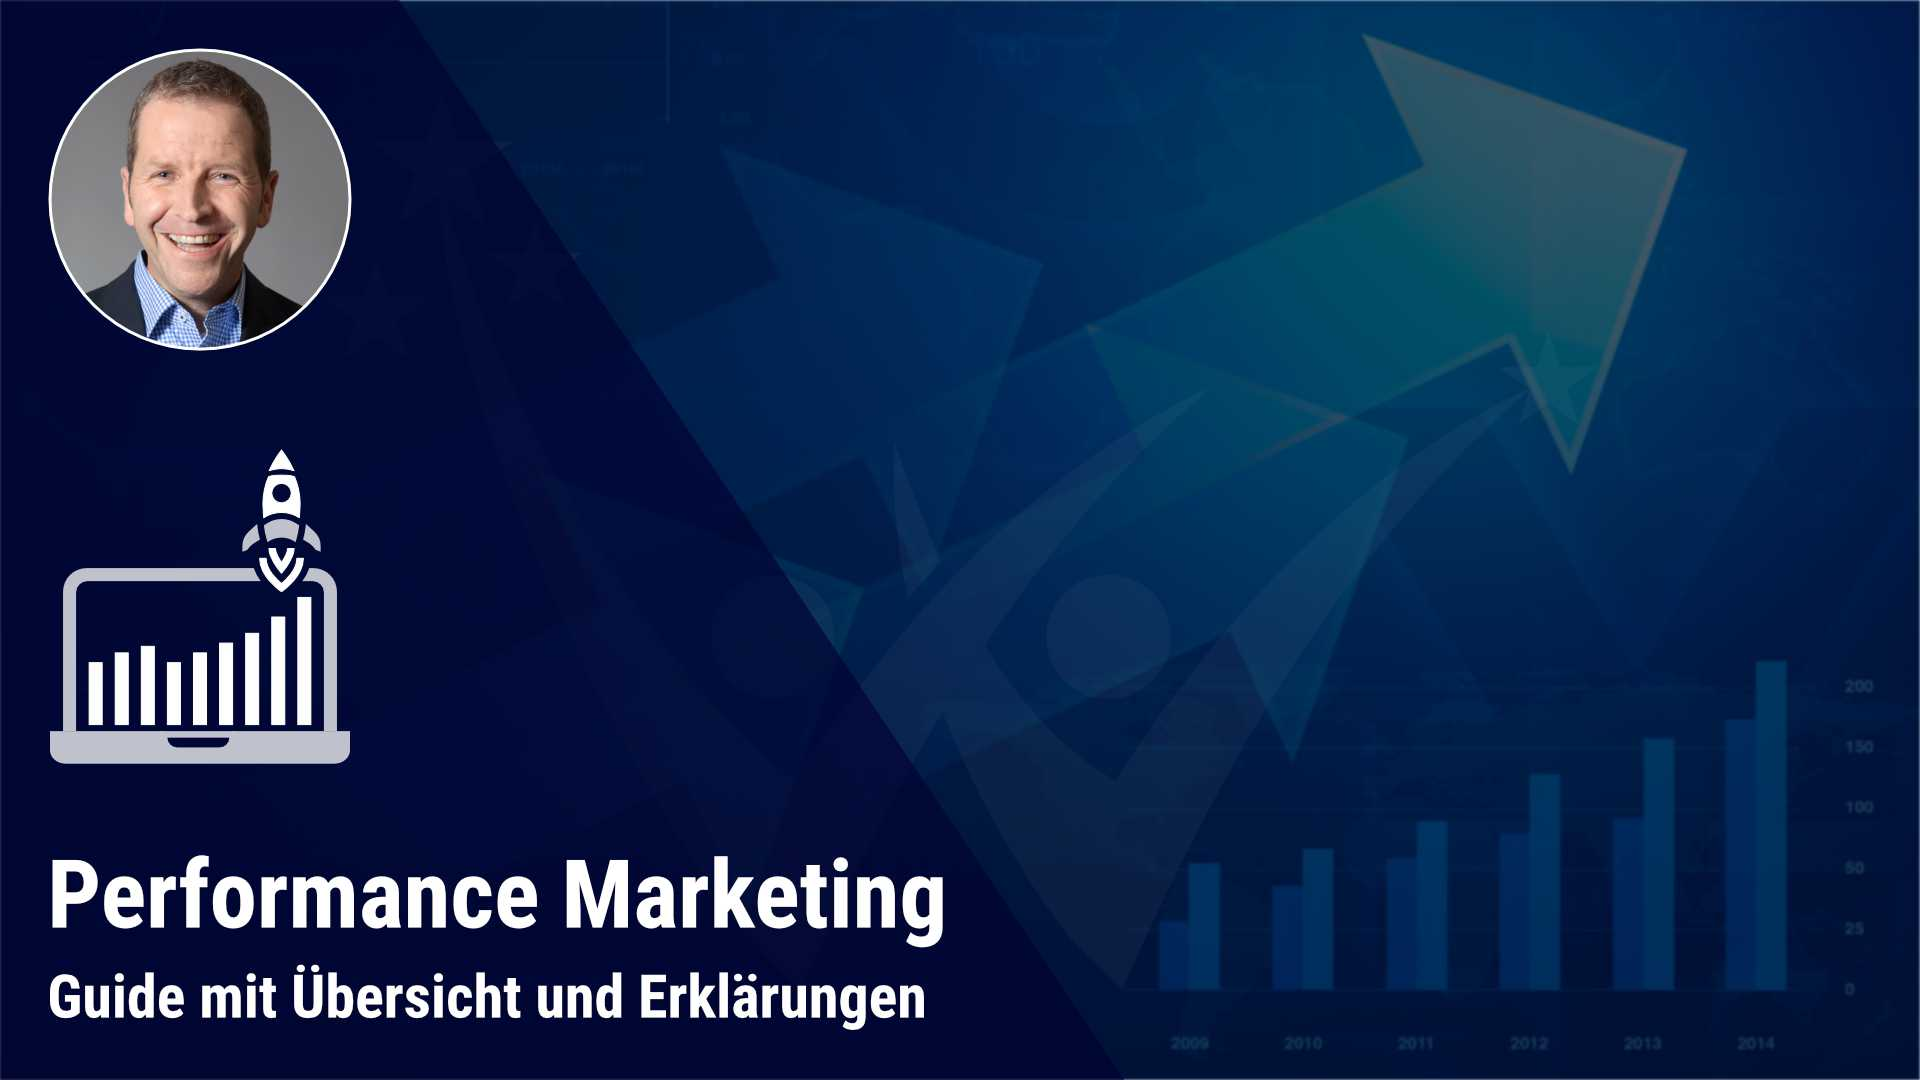 Performance Marketing Guide by Winning Marketing